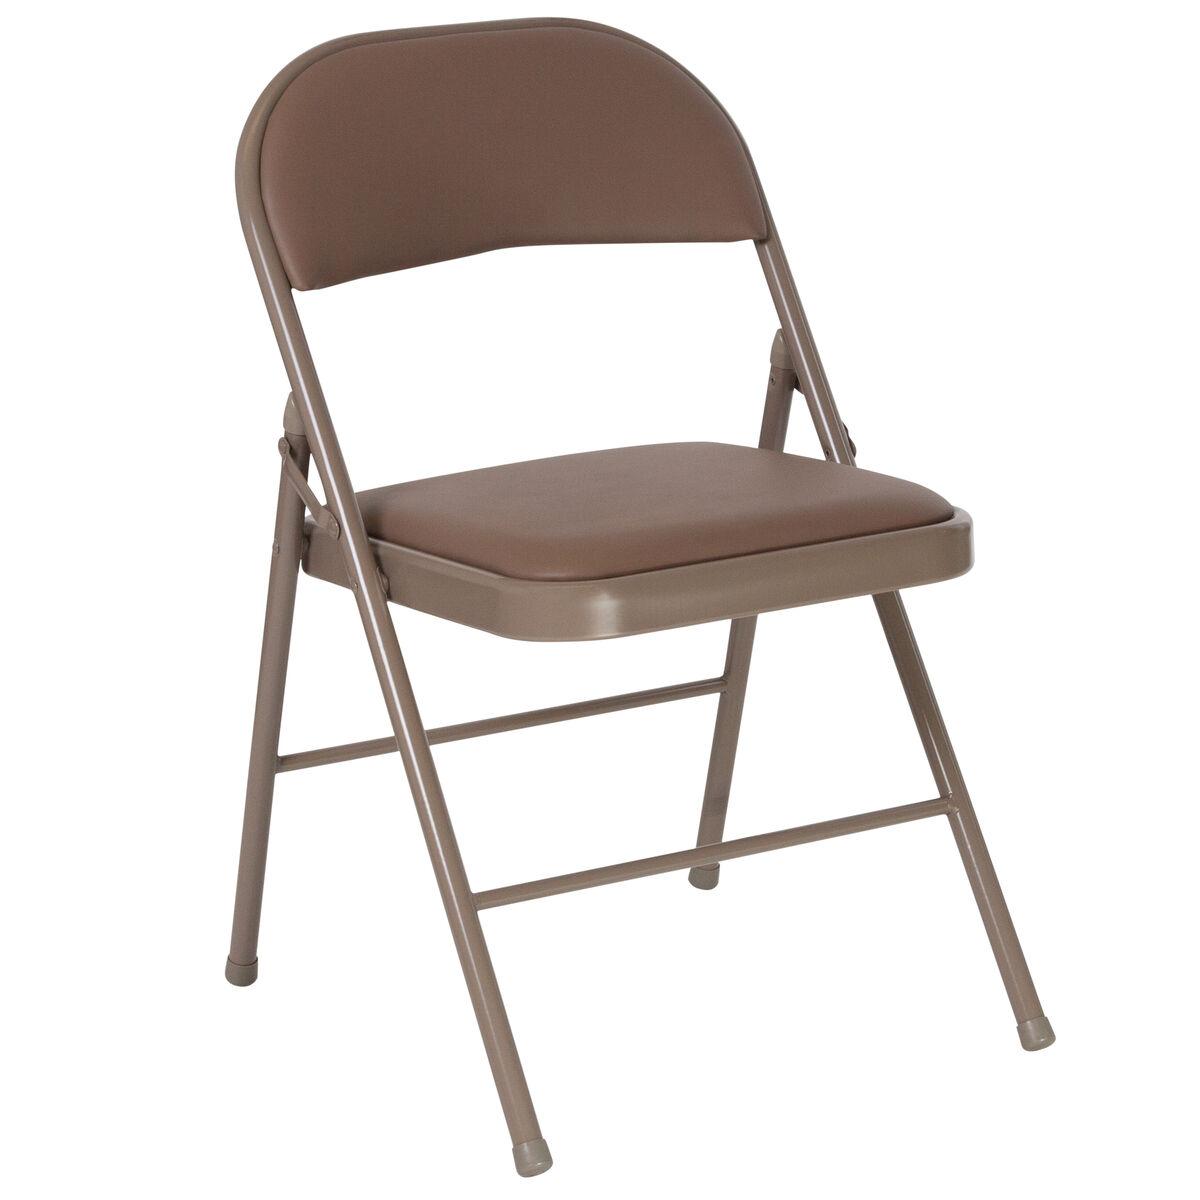 Beige Vinyl Folding Chair Ha F003d Bge Gg